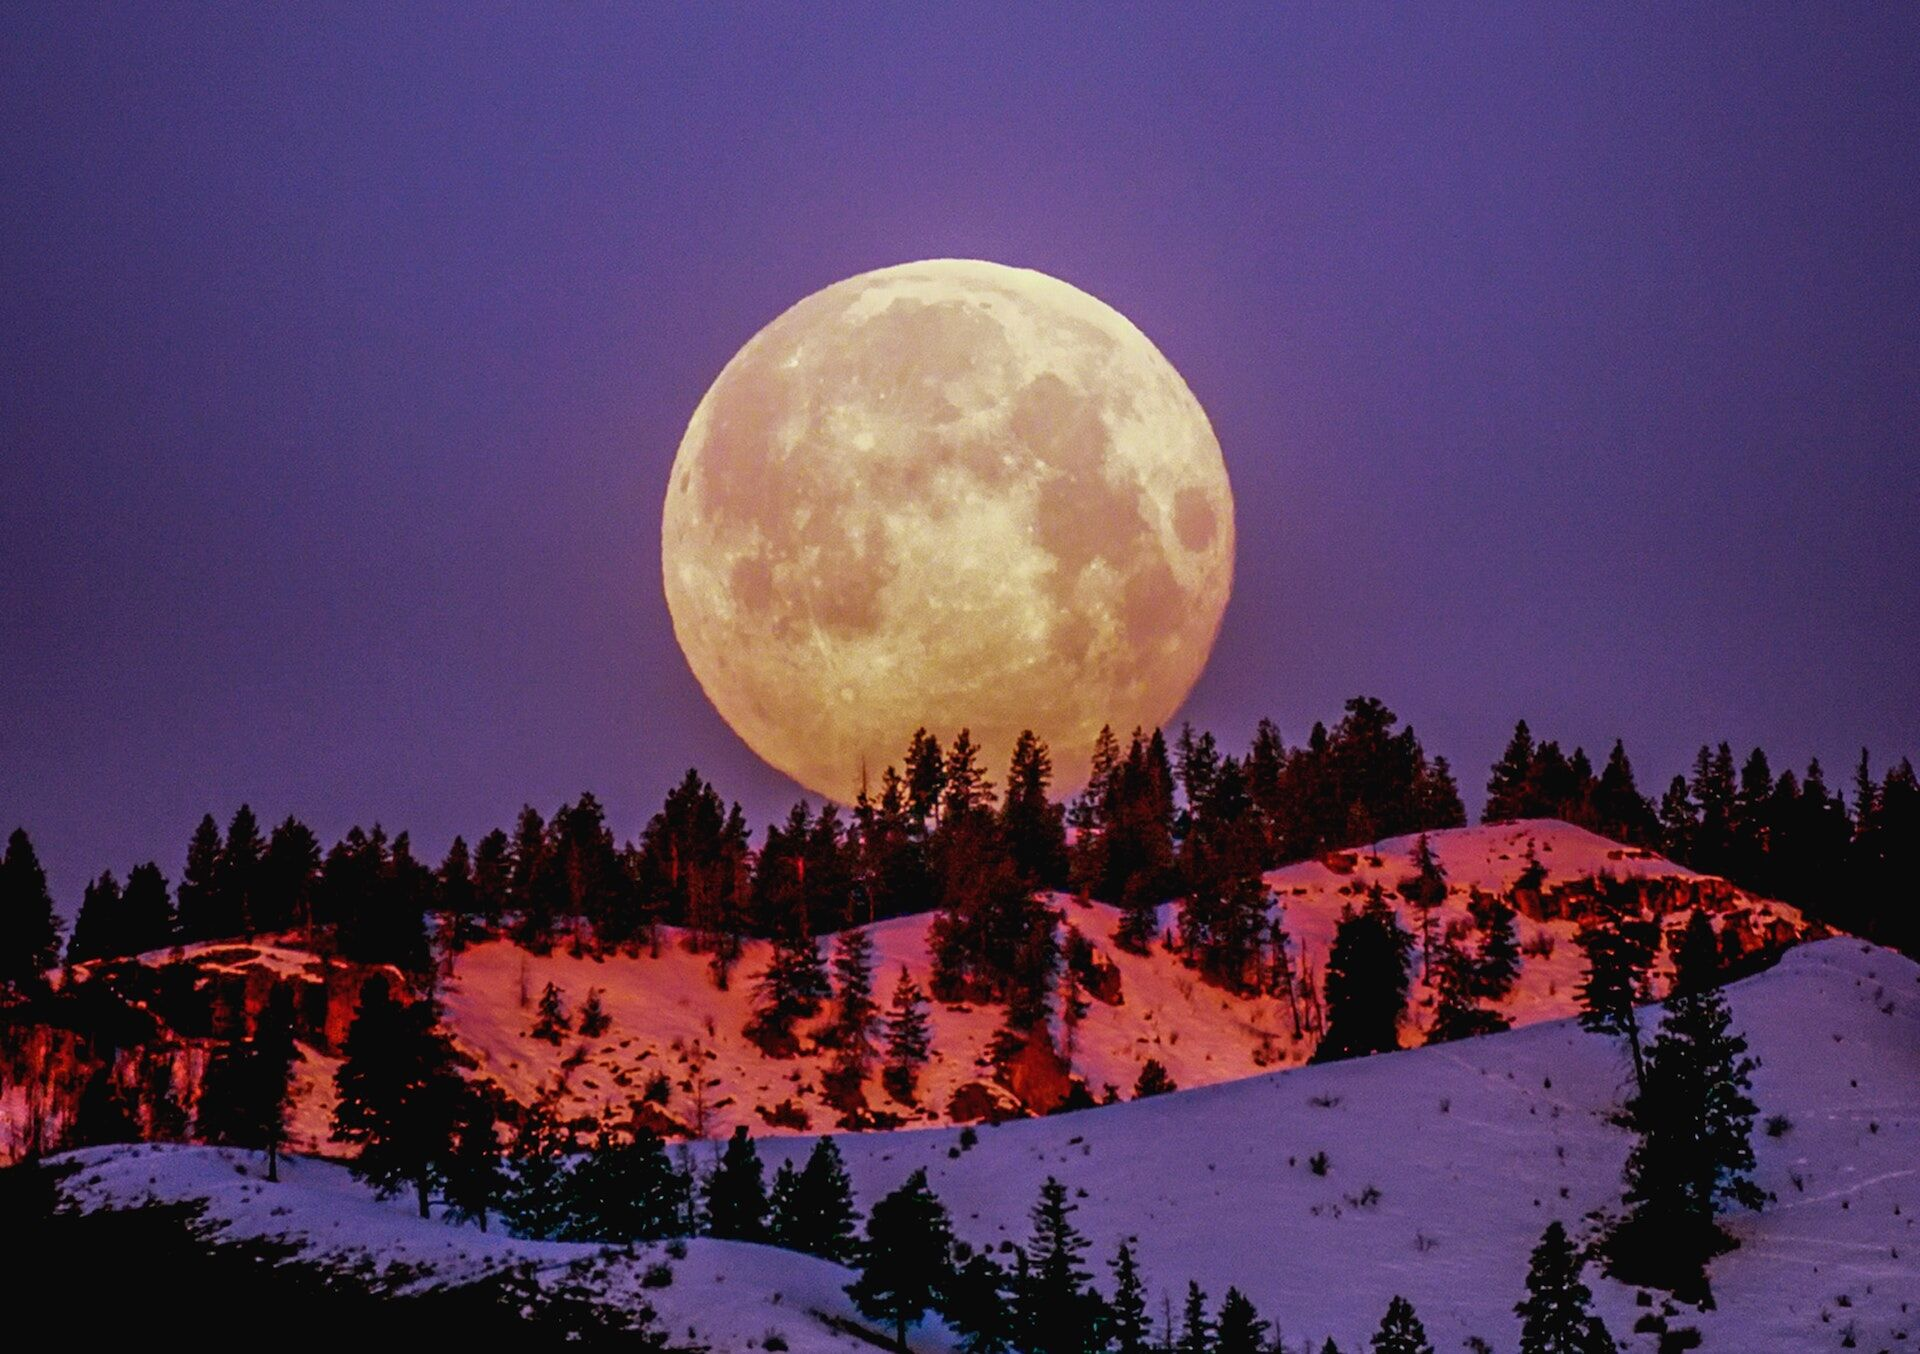 luna-llena-full-moon-18012020in1